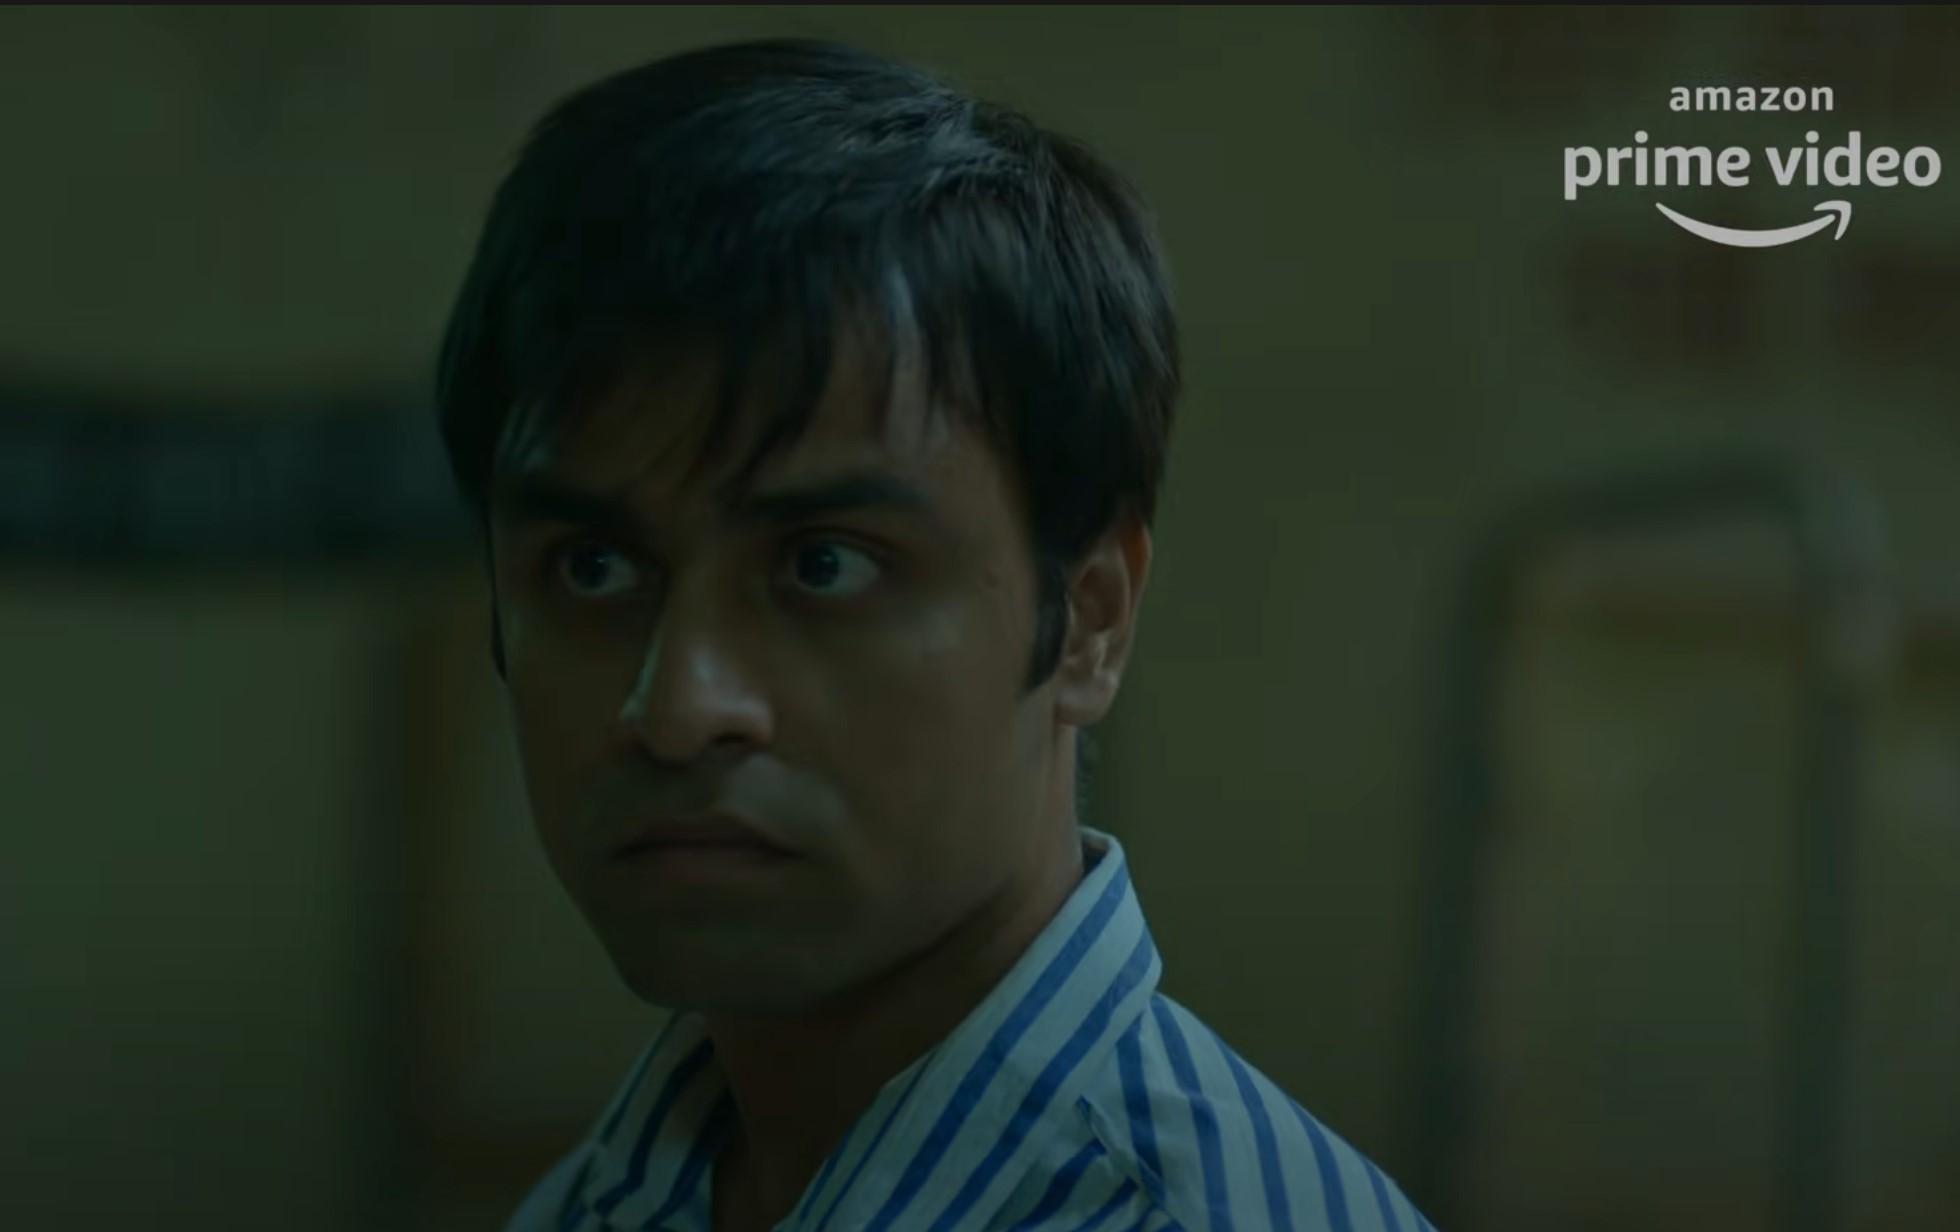 Panchayat Season 2 Release Date on Prime Video   Jitendra Kumar to Return for Another Season?